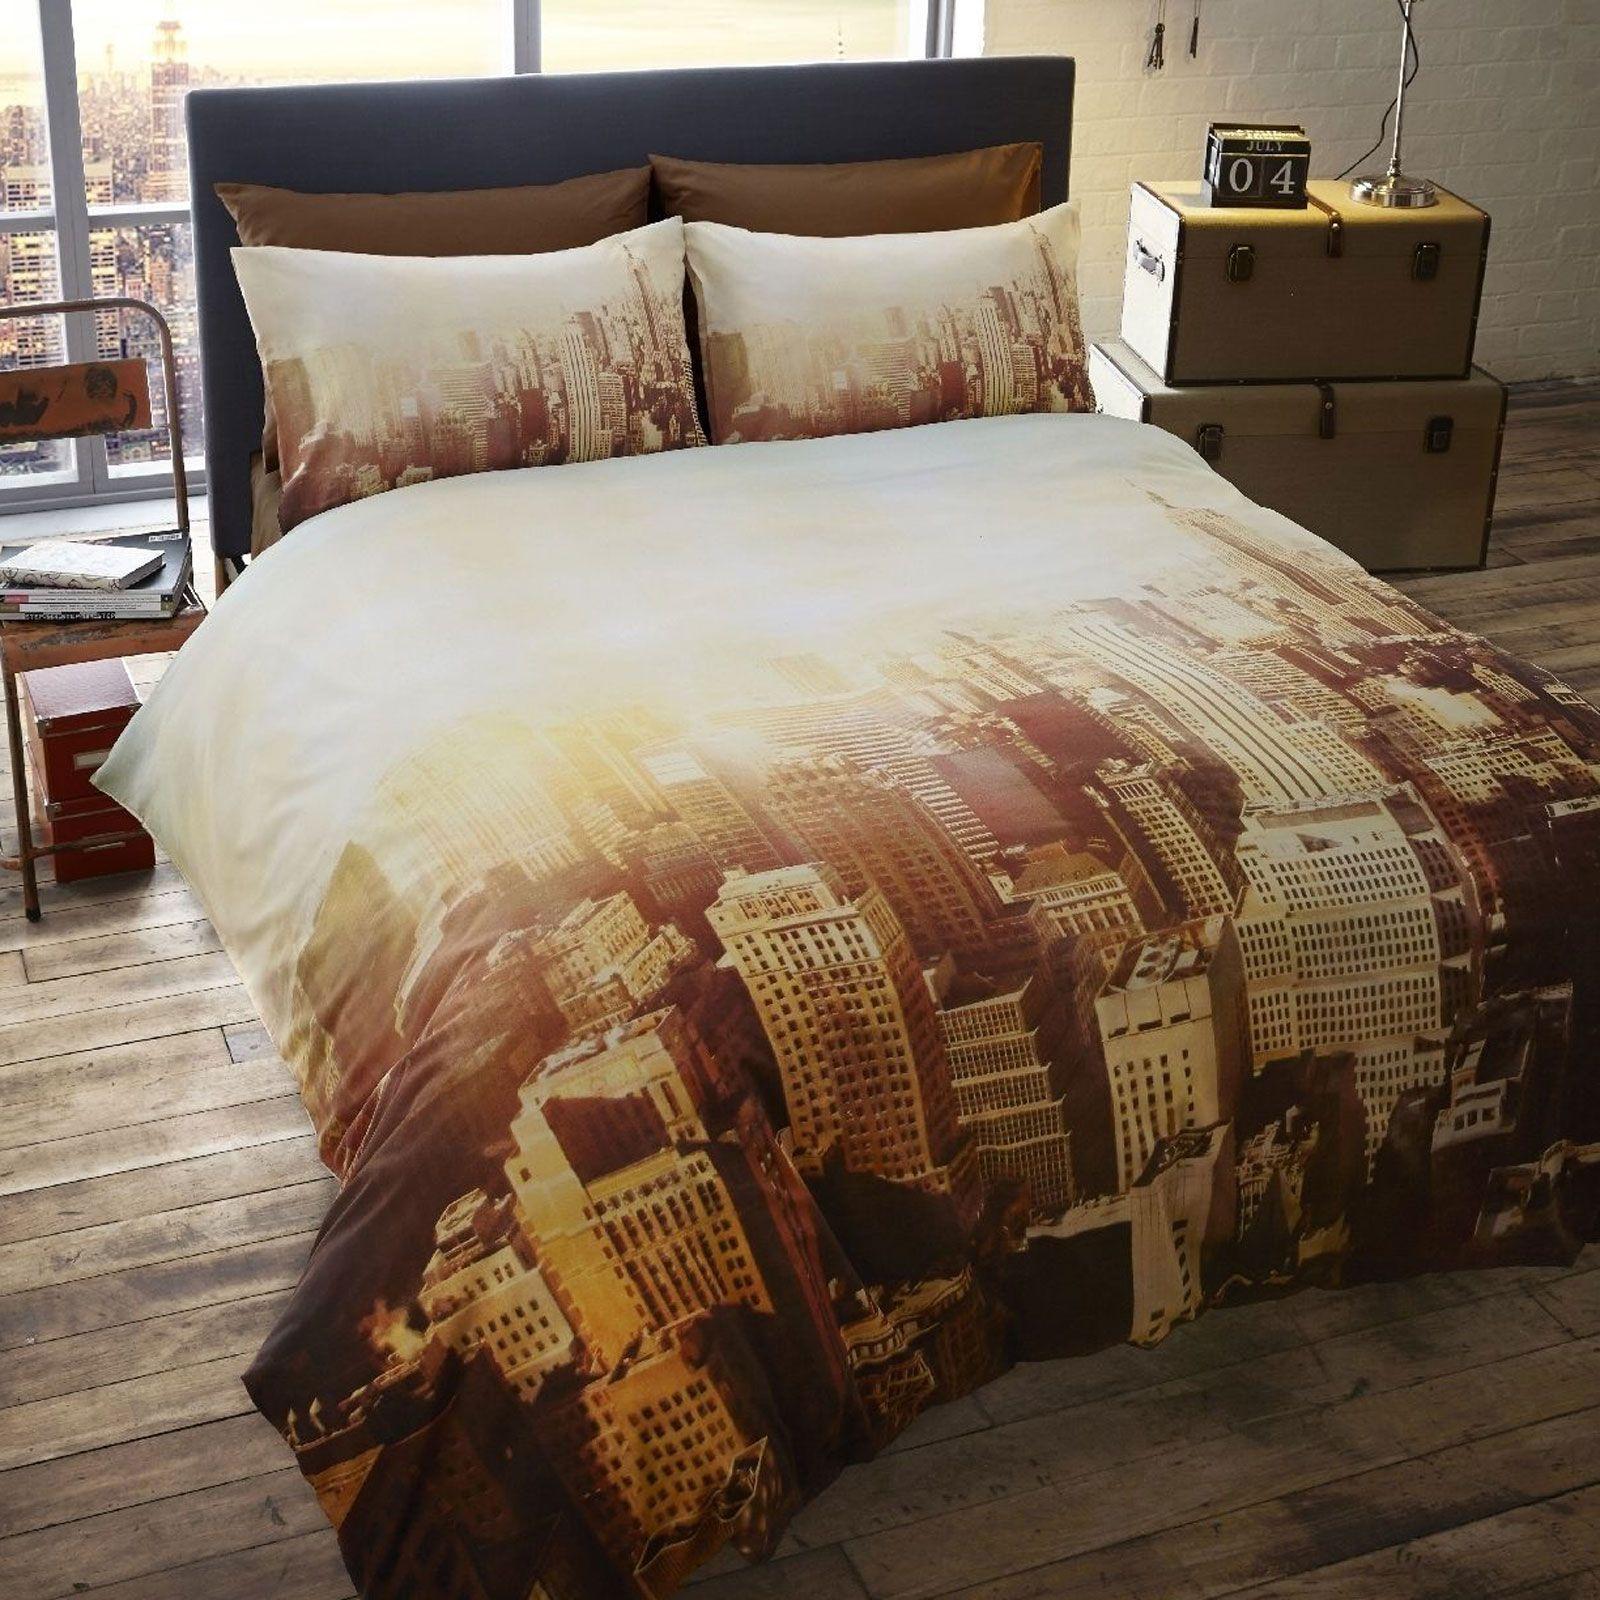 New York Bed Set New York City Skyline Bedding Nyc Themed Bedroom Ideas Image Gallery New